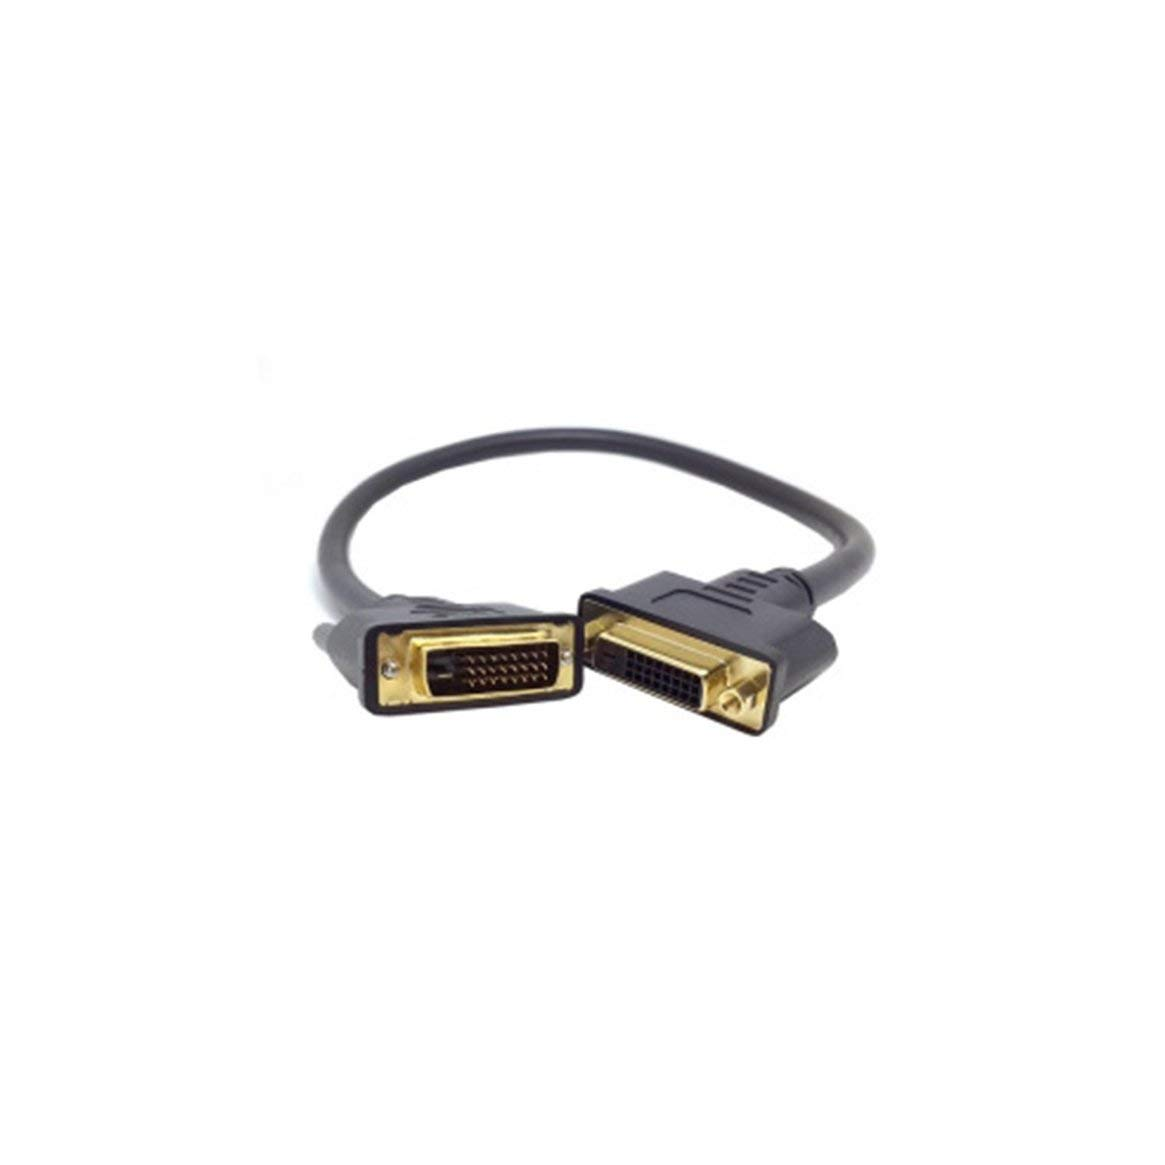 0.5 Metri DVI -D Dual Link Maschio Digitale 24 1 Femmina Cavo prolunga Video per Monitor Proiettore 1 a DVI 24 Nero